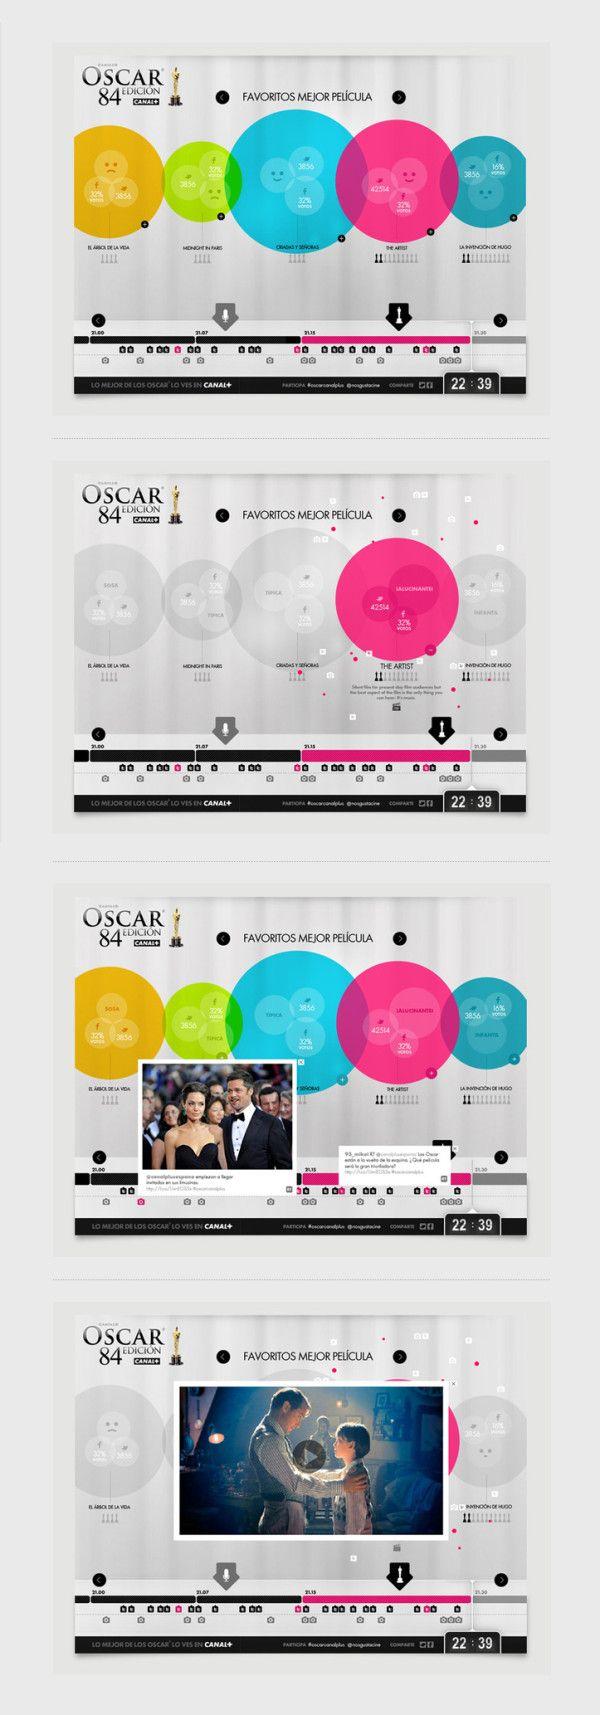 #webdesign #website #oscars #behance on #Twitpic